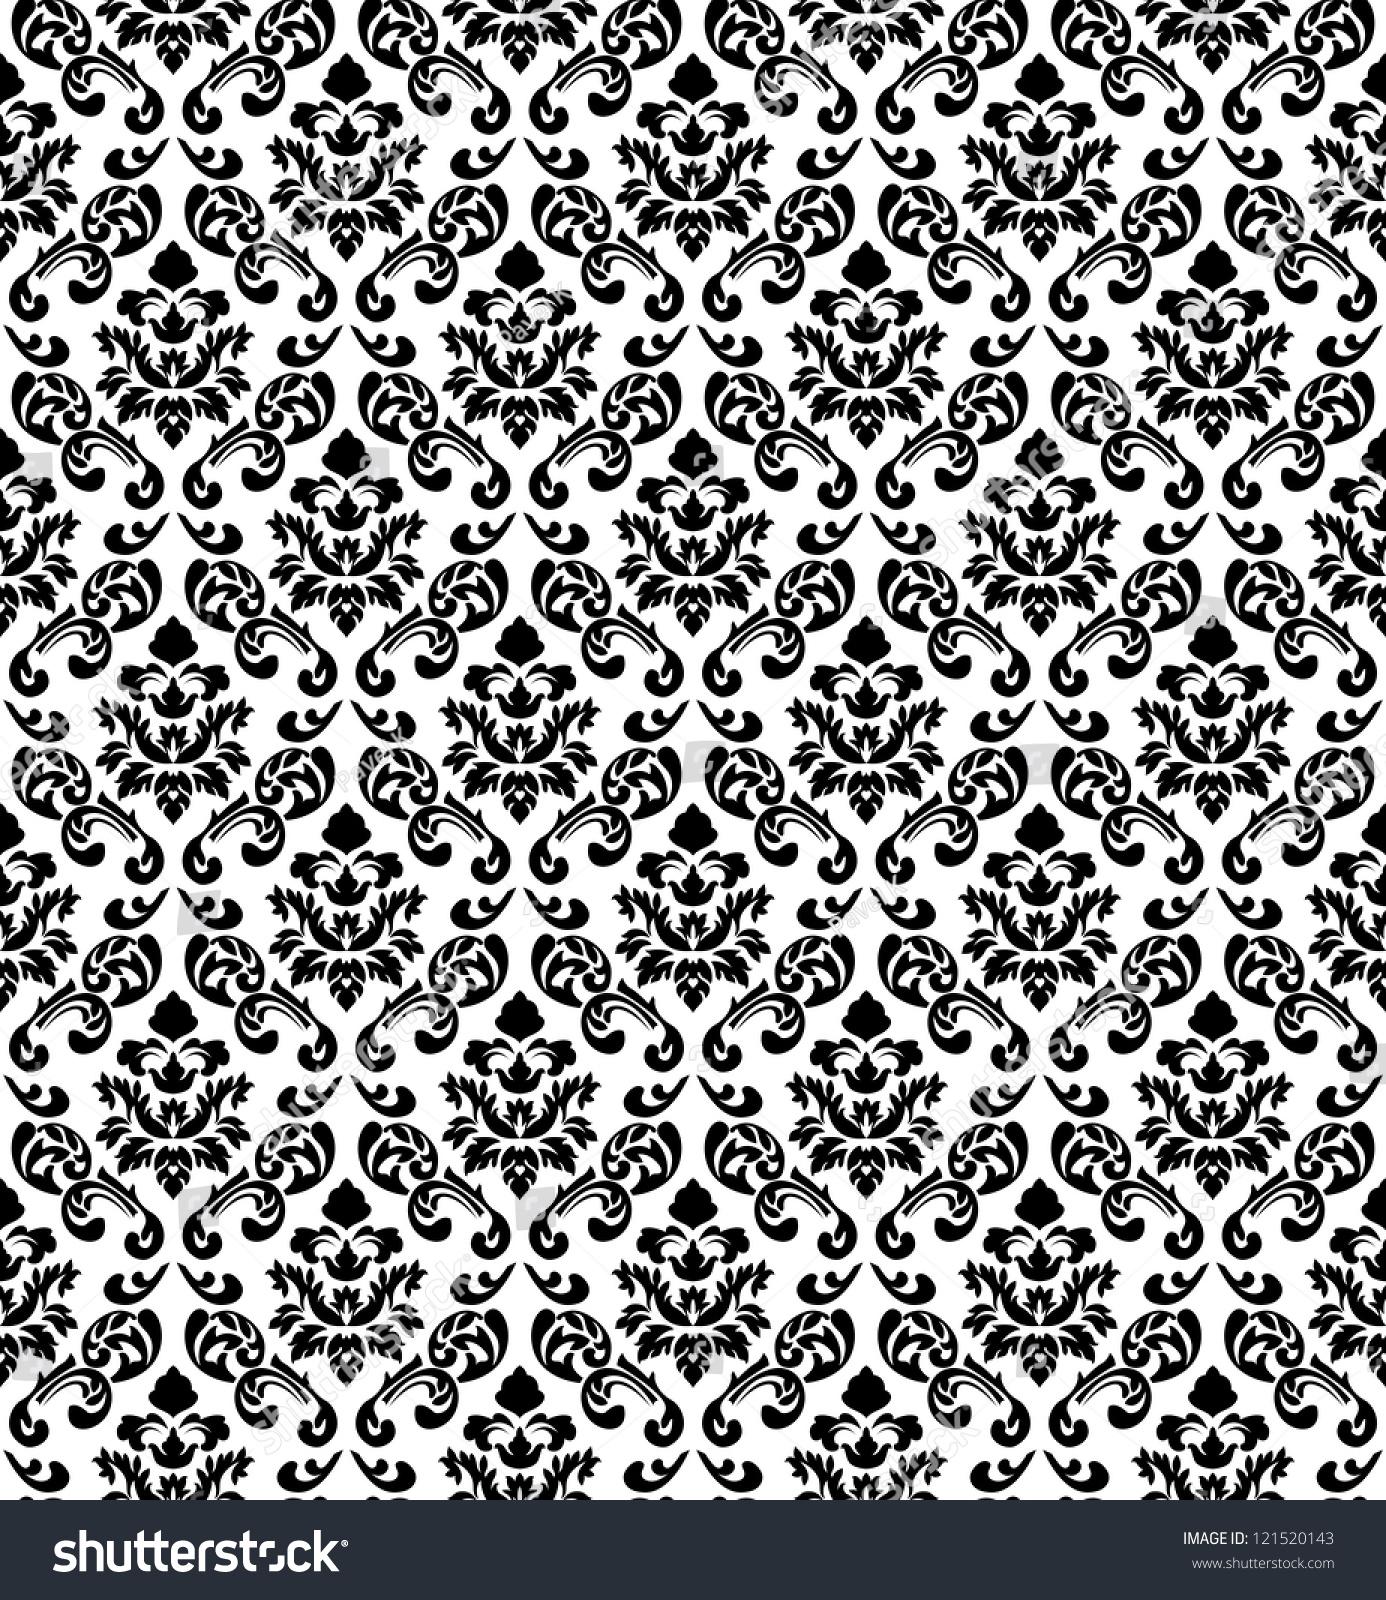 swirling royal pattern wallpaper - photo #9